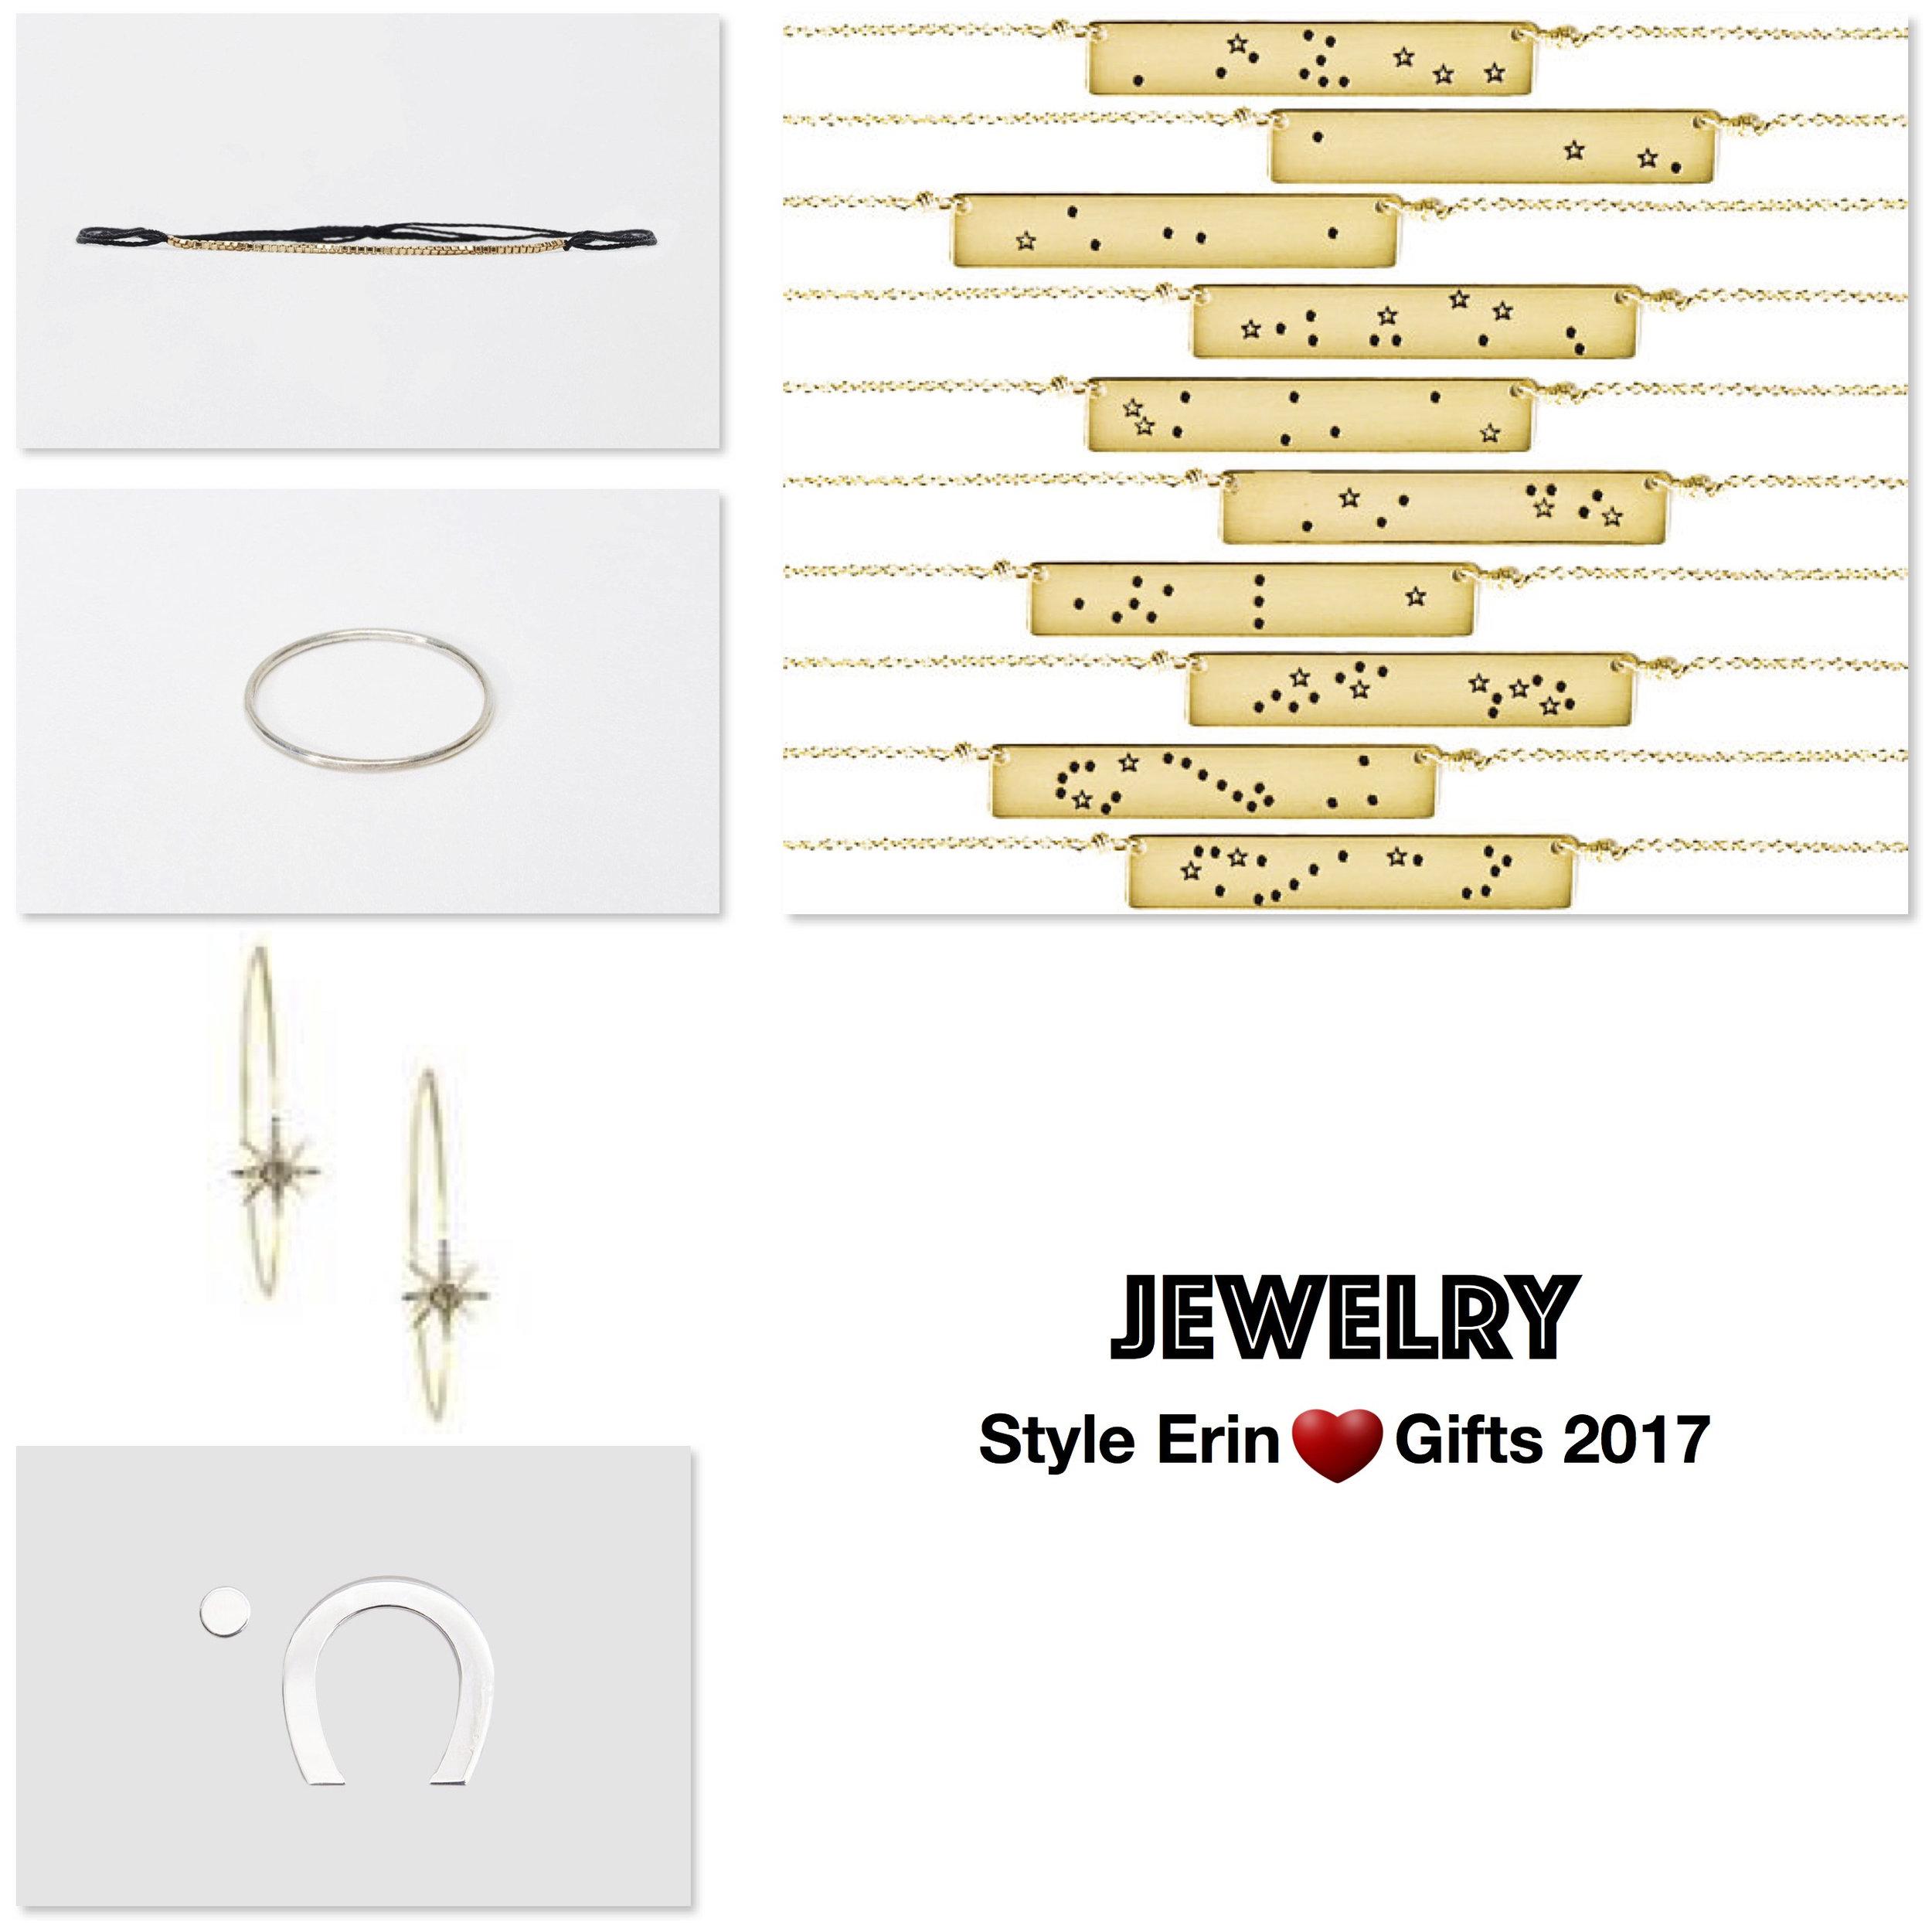 jewelrygifts-website.jpg